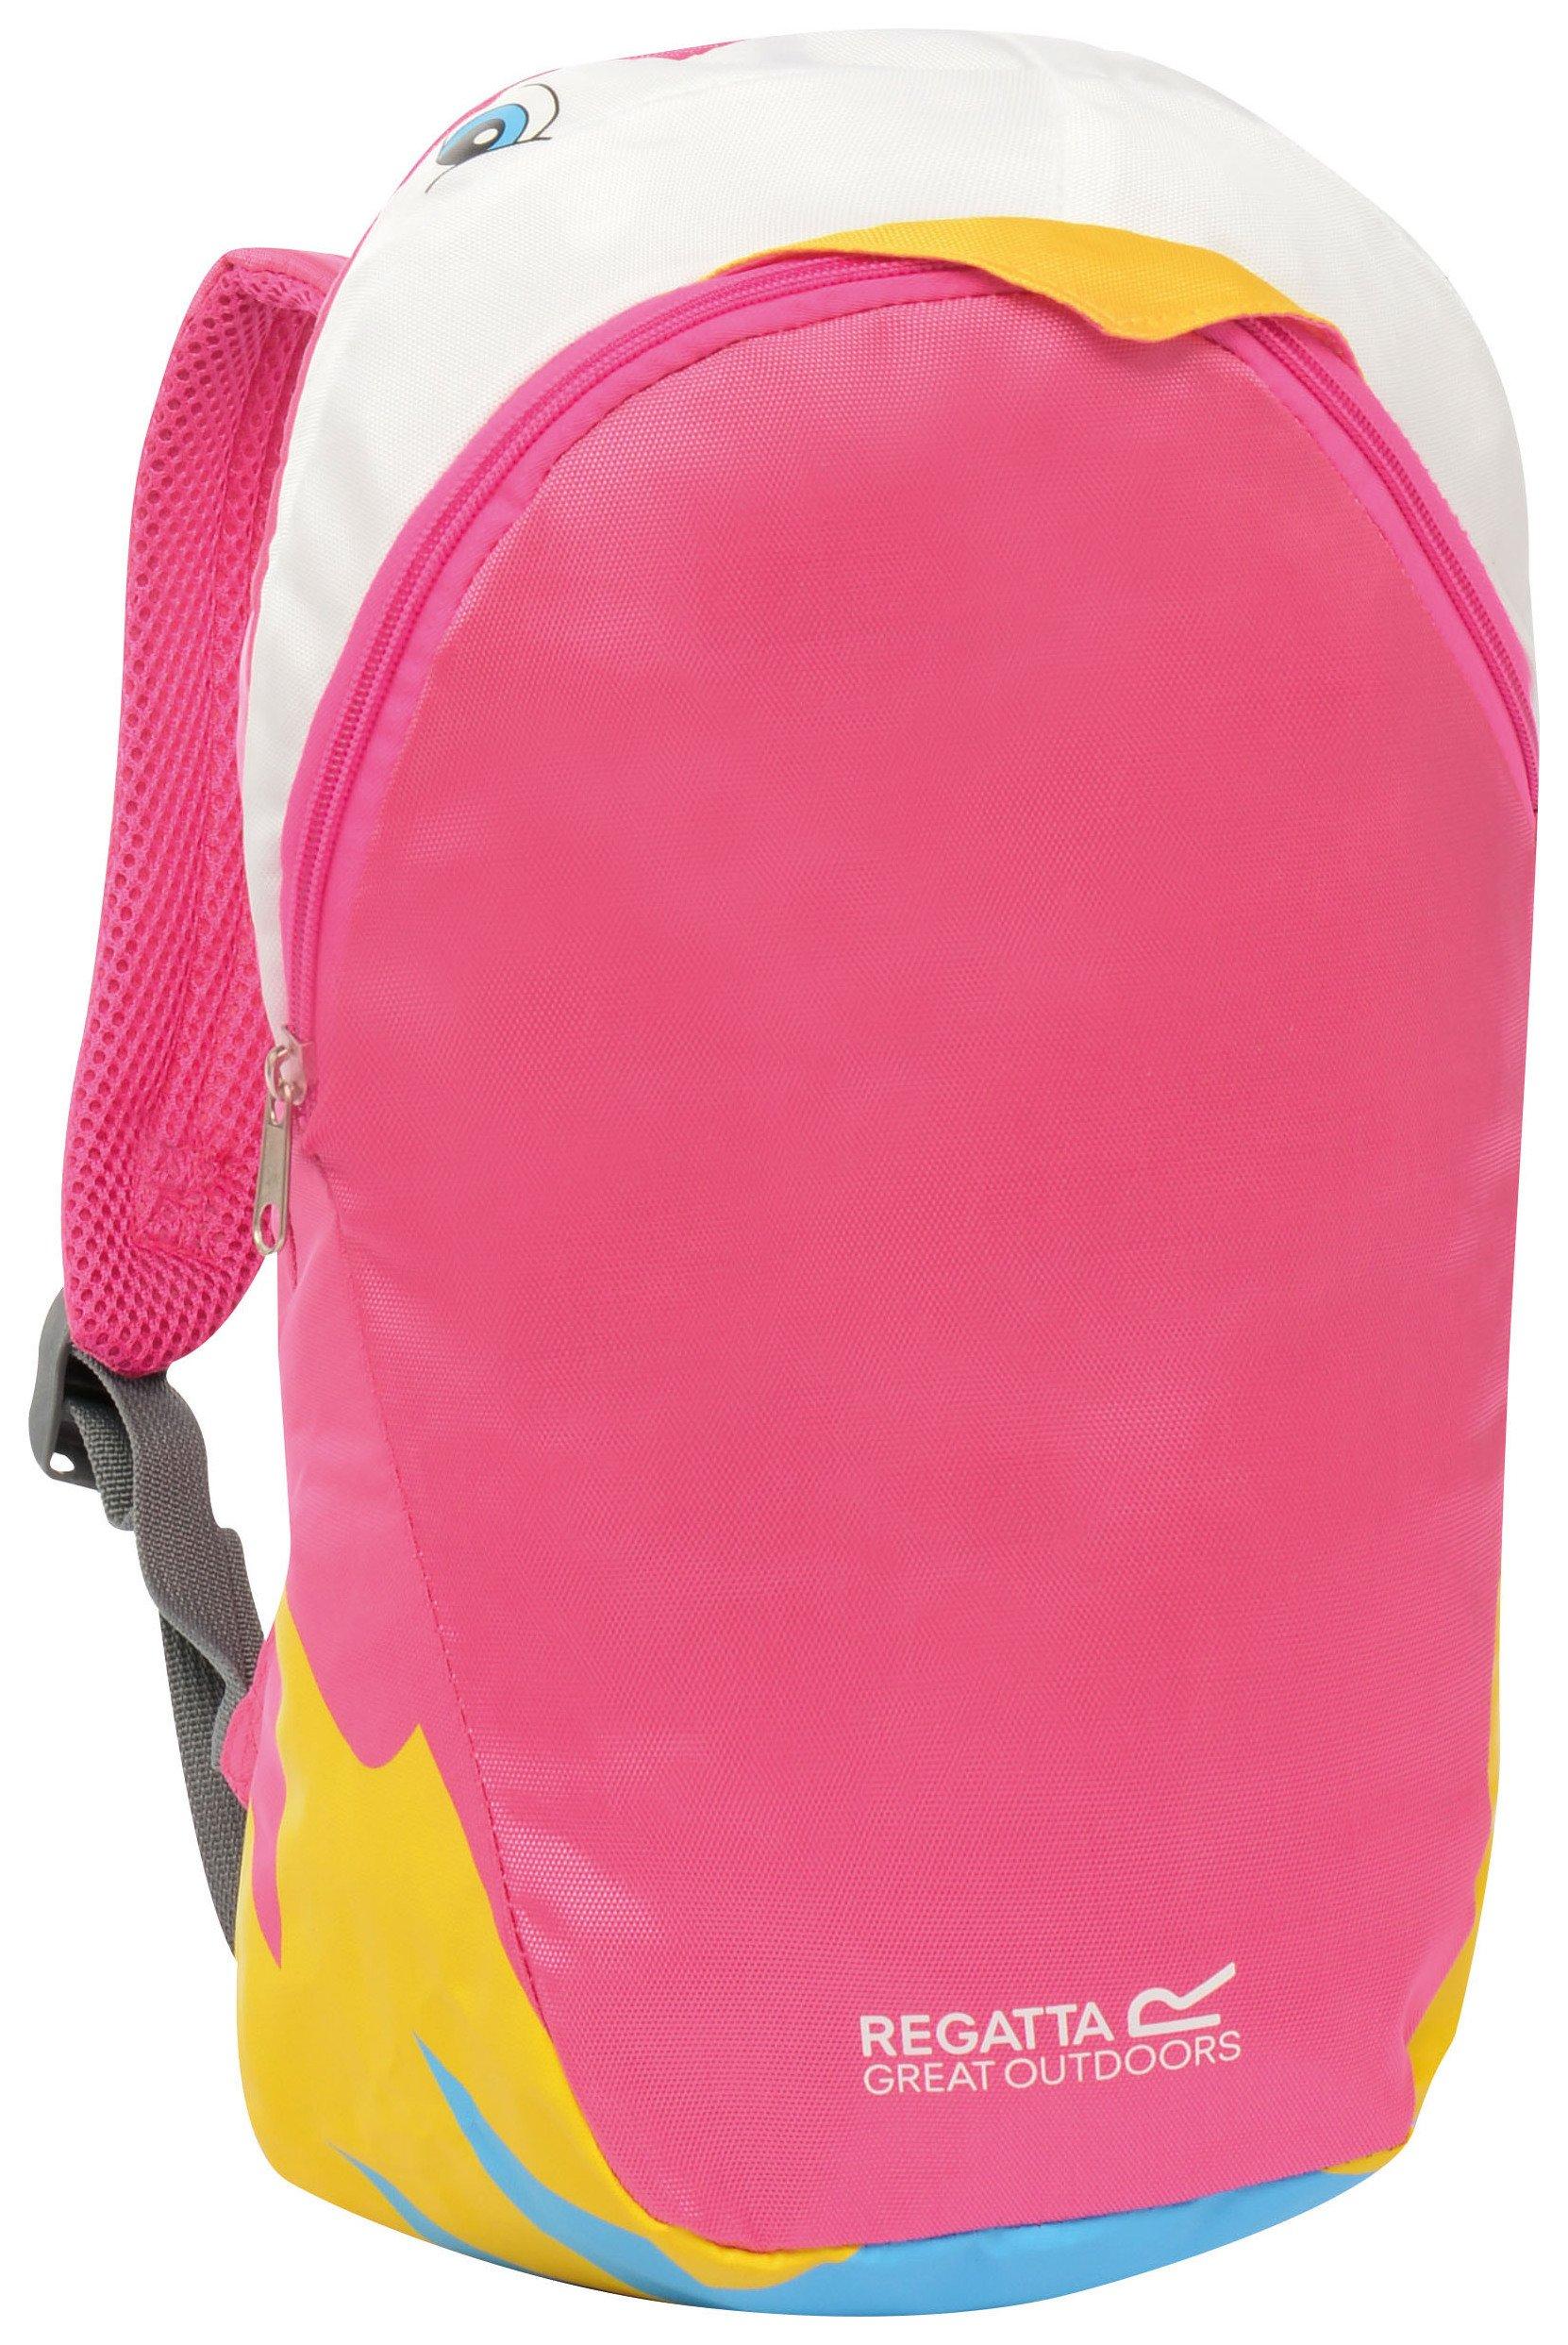 Regatta - Zephyr Parrot Daypack - Pink lowest price